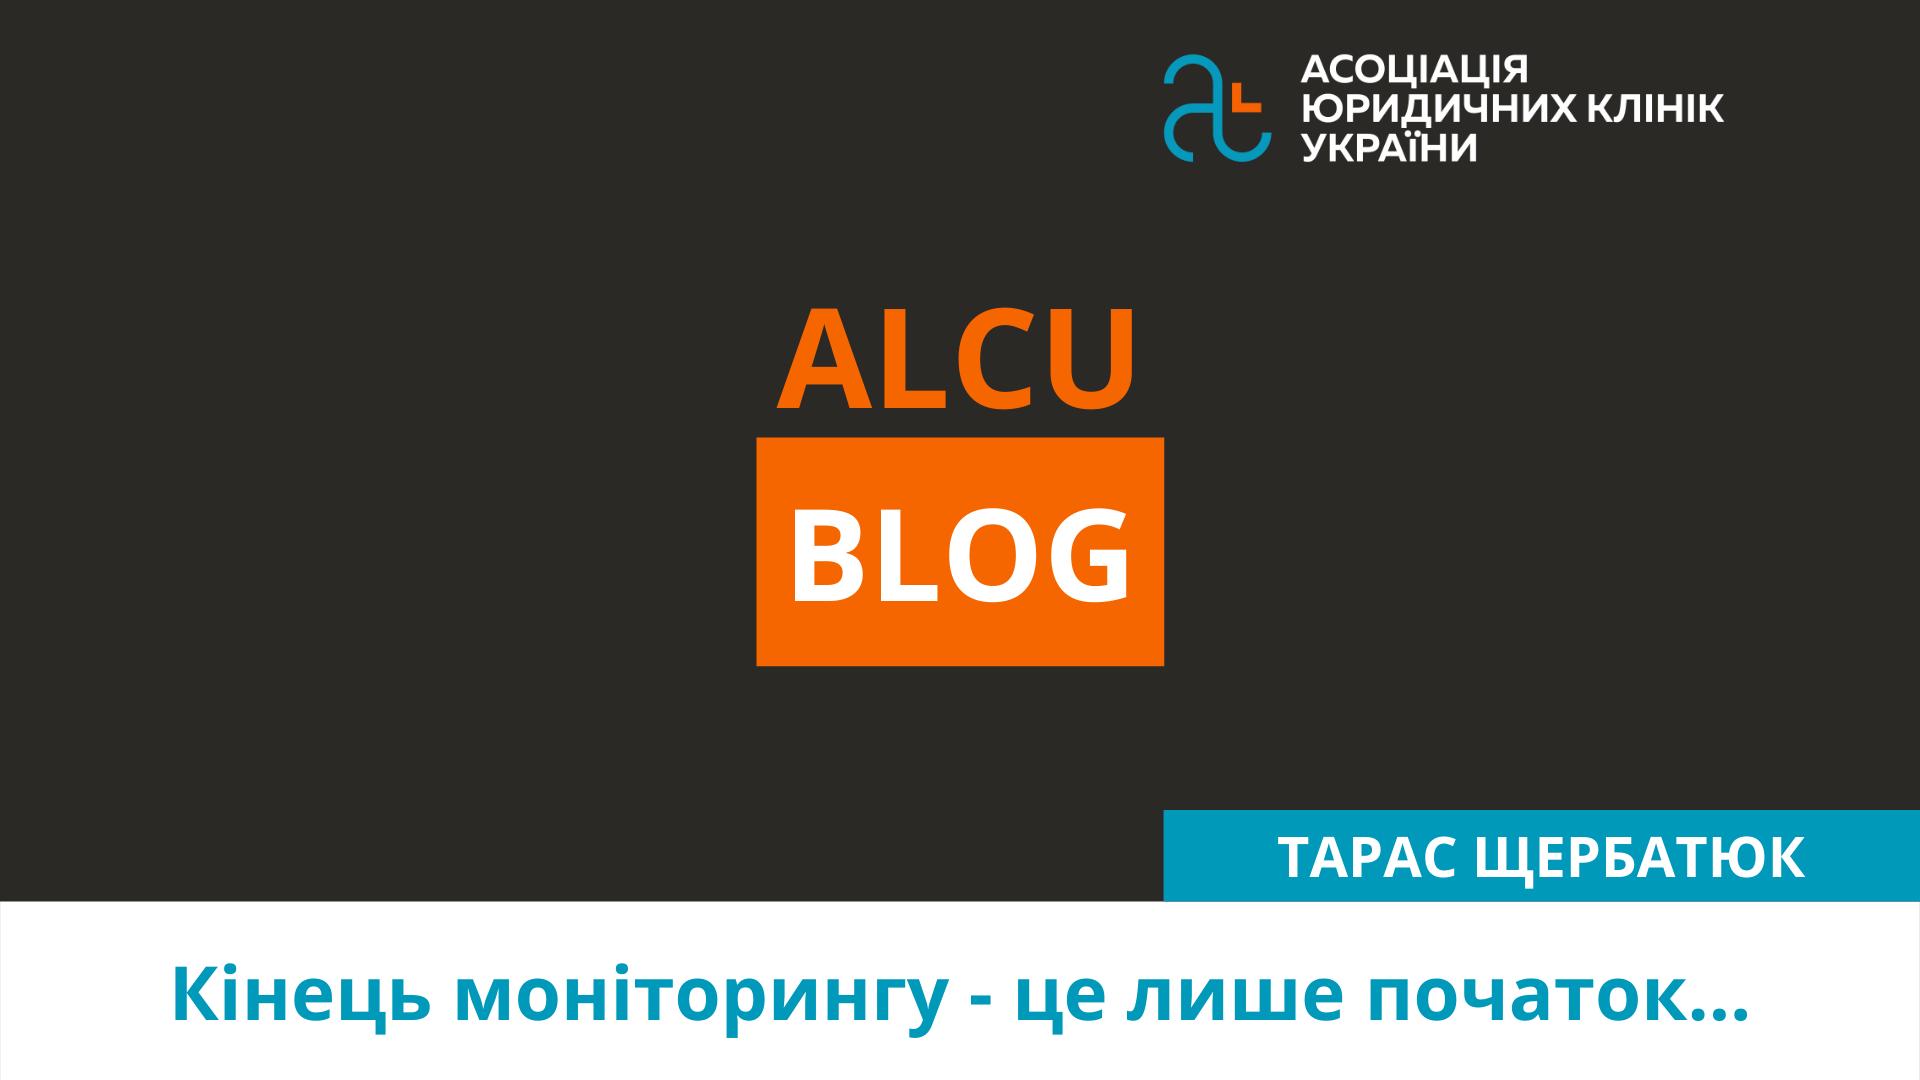 Taras Shcherbatiuk: The end of monitoring is only the beginning…